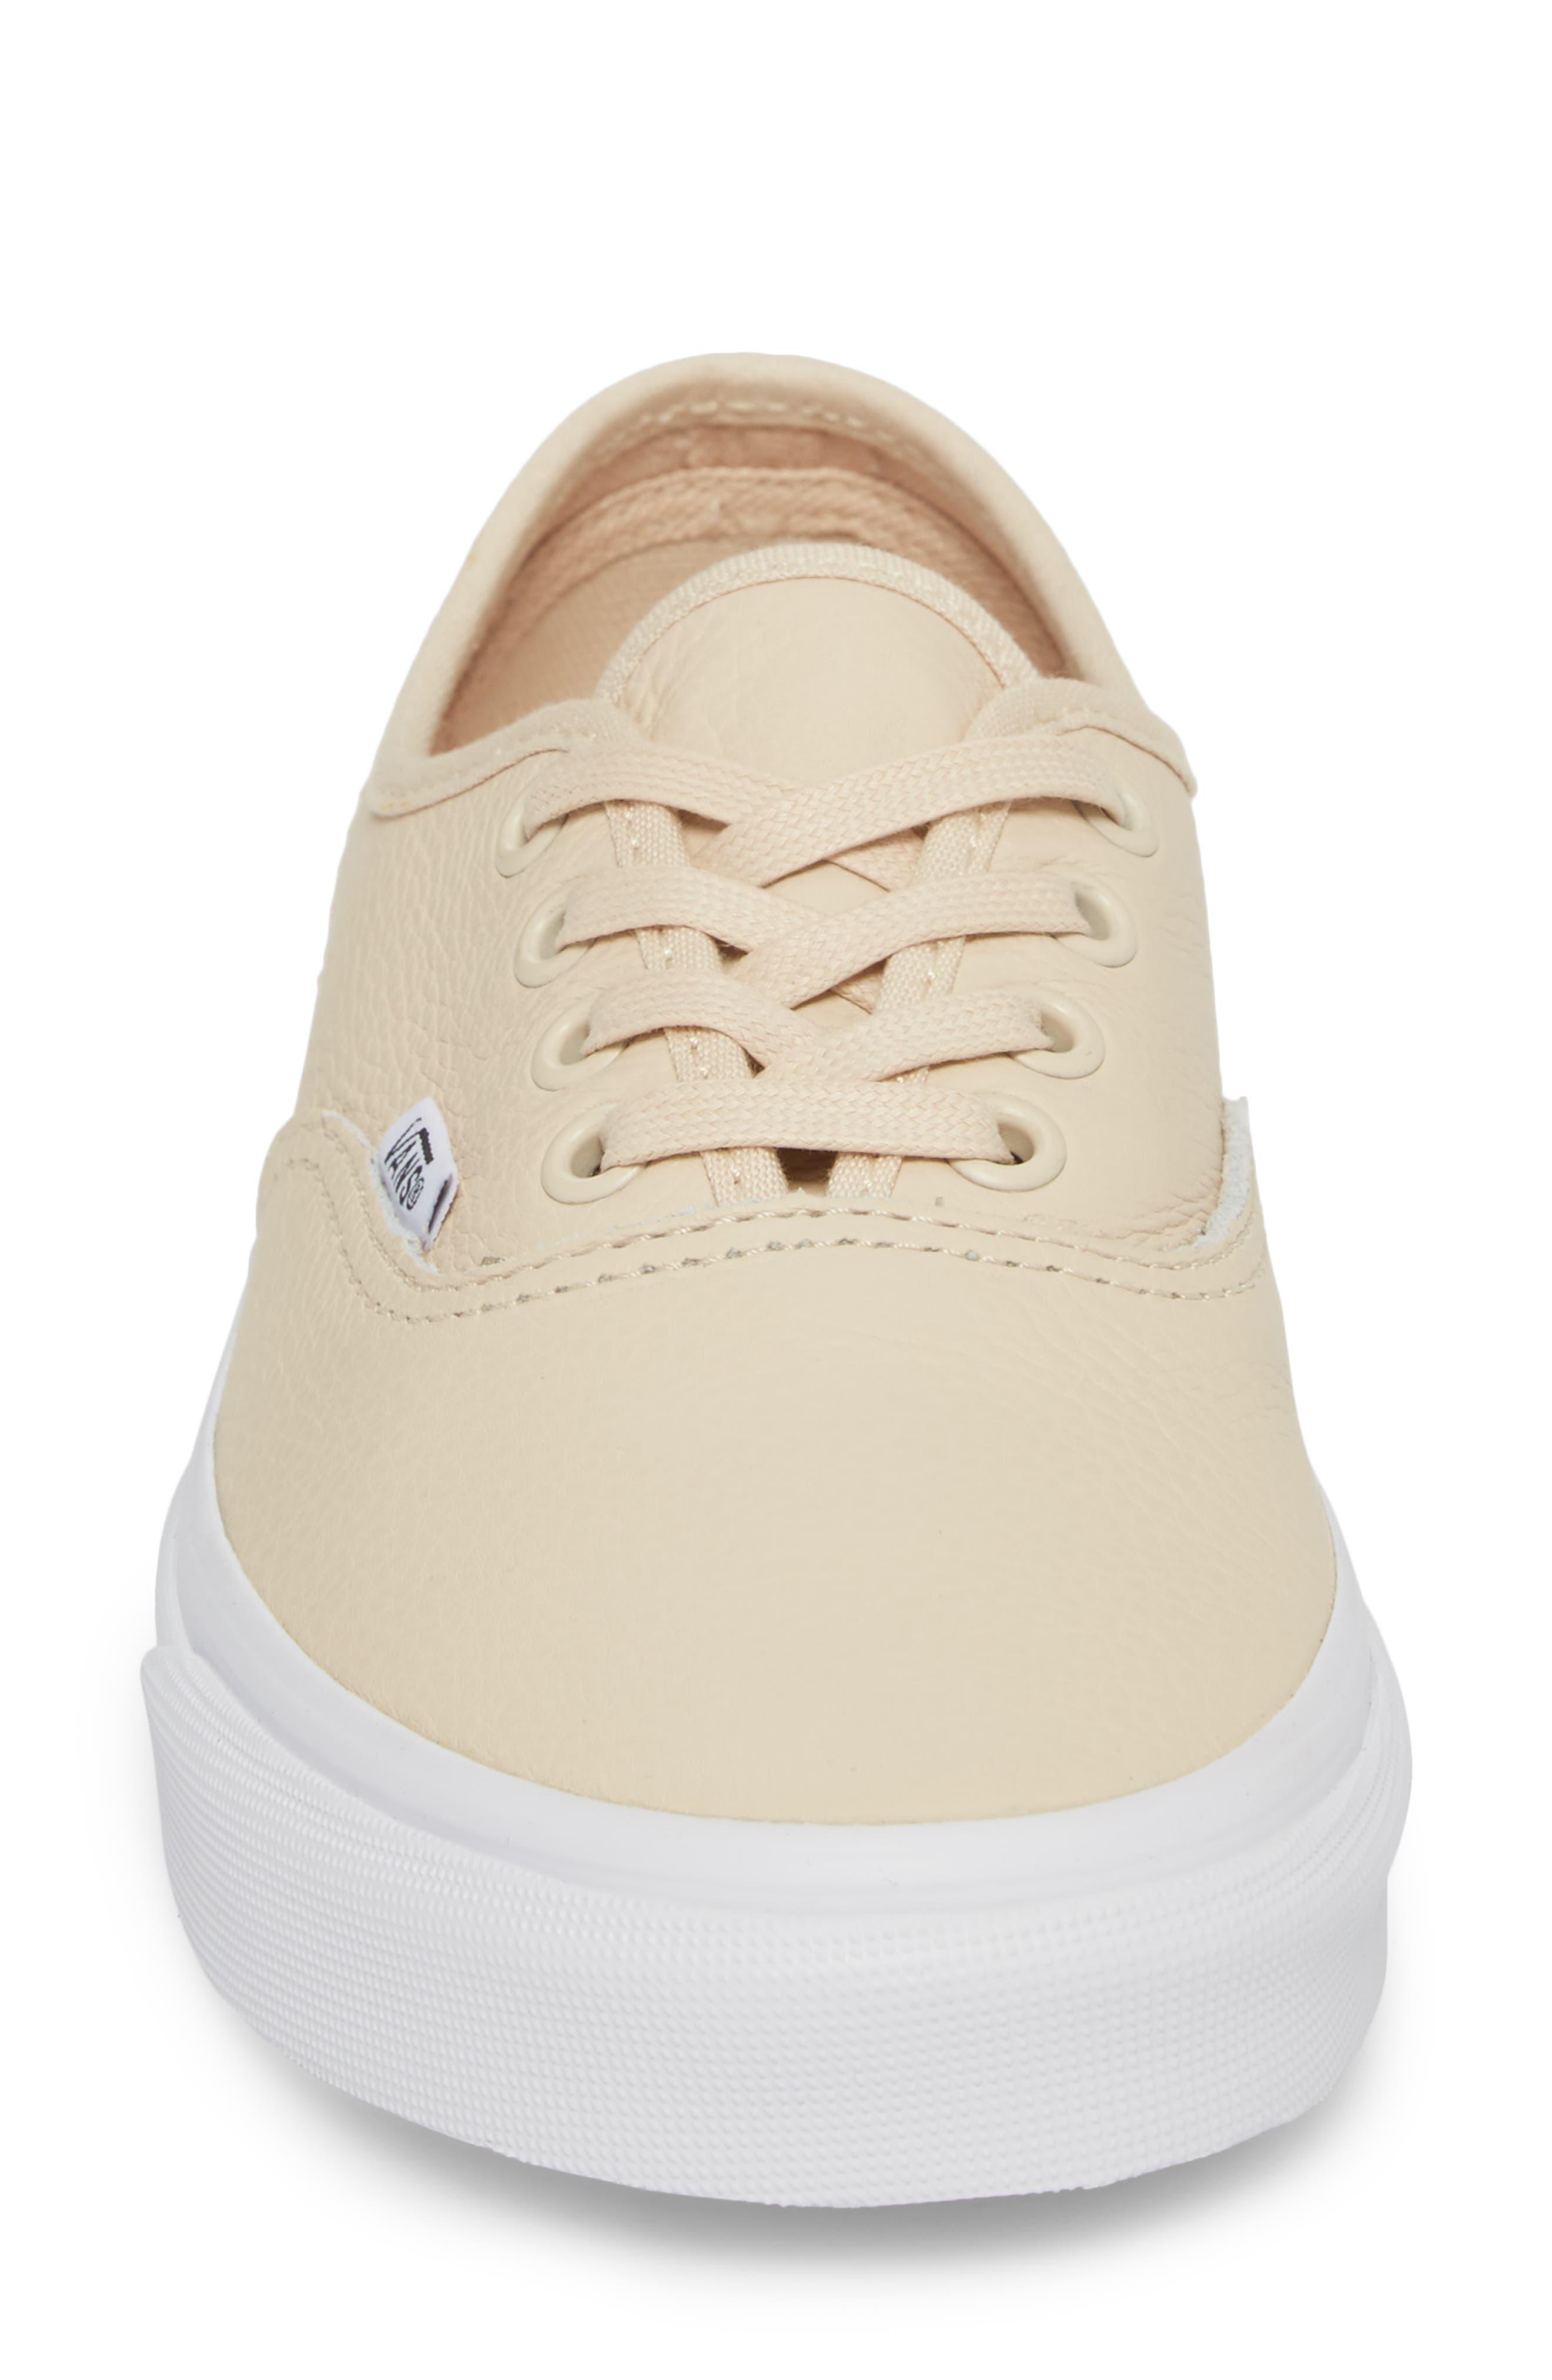 ,                             'Authentic' Sneaker,                             Alternate thumbnail 243, color,                             270